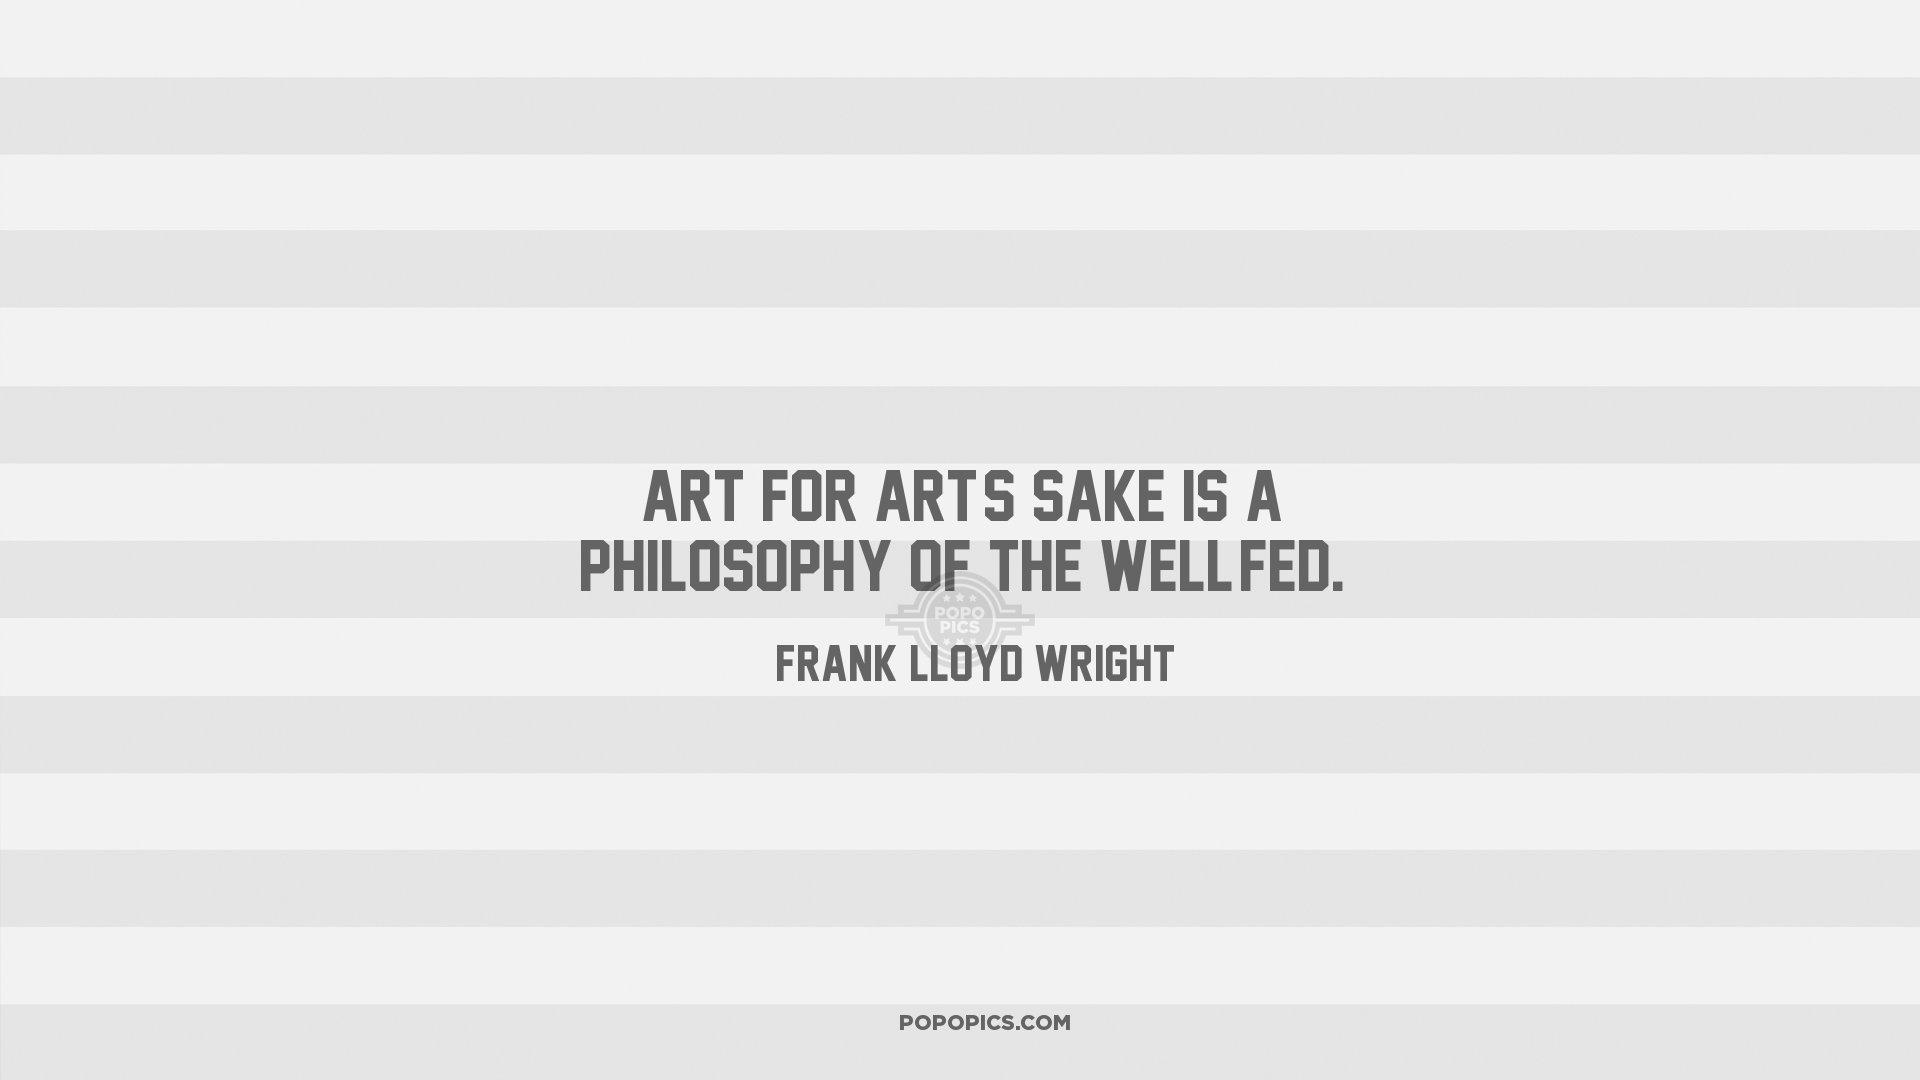 Frank Lloyd Wright. Sake; Philosophy. Download; 3 Downloads